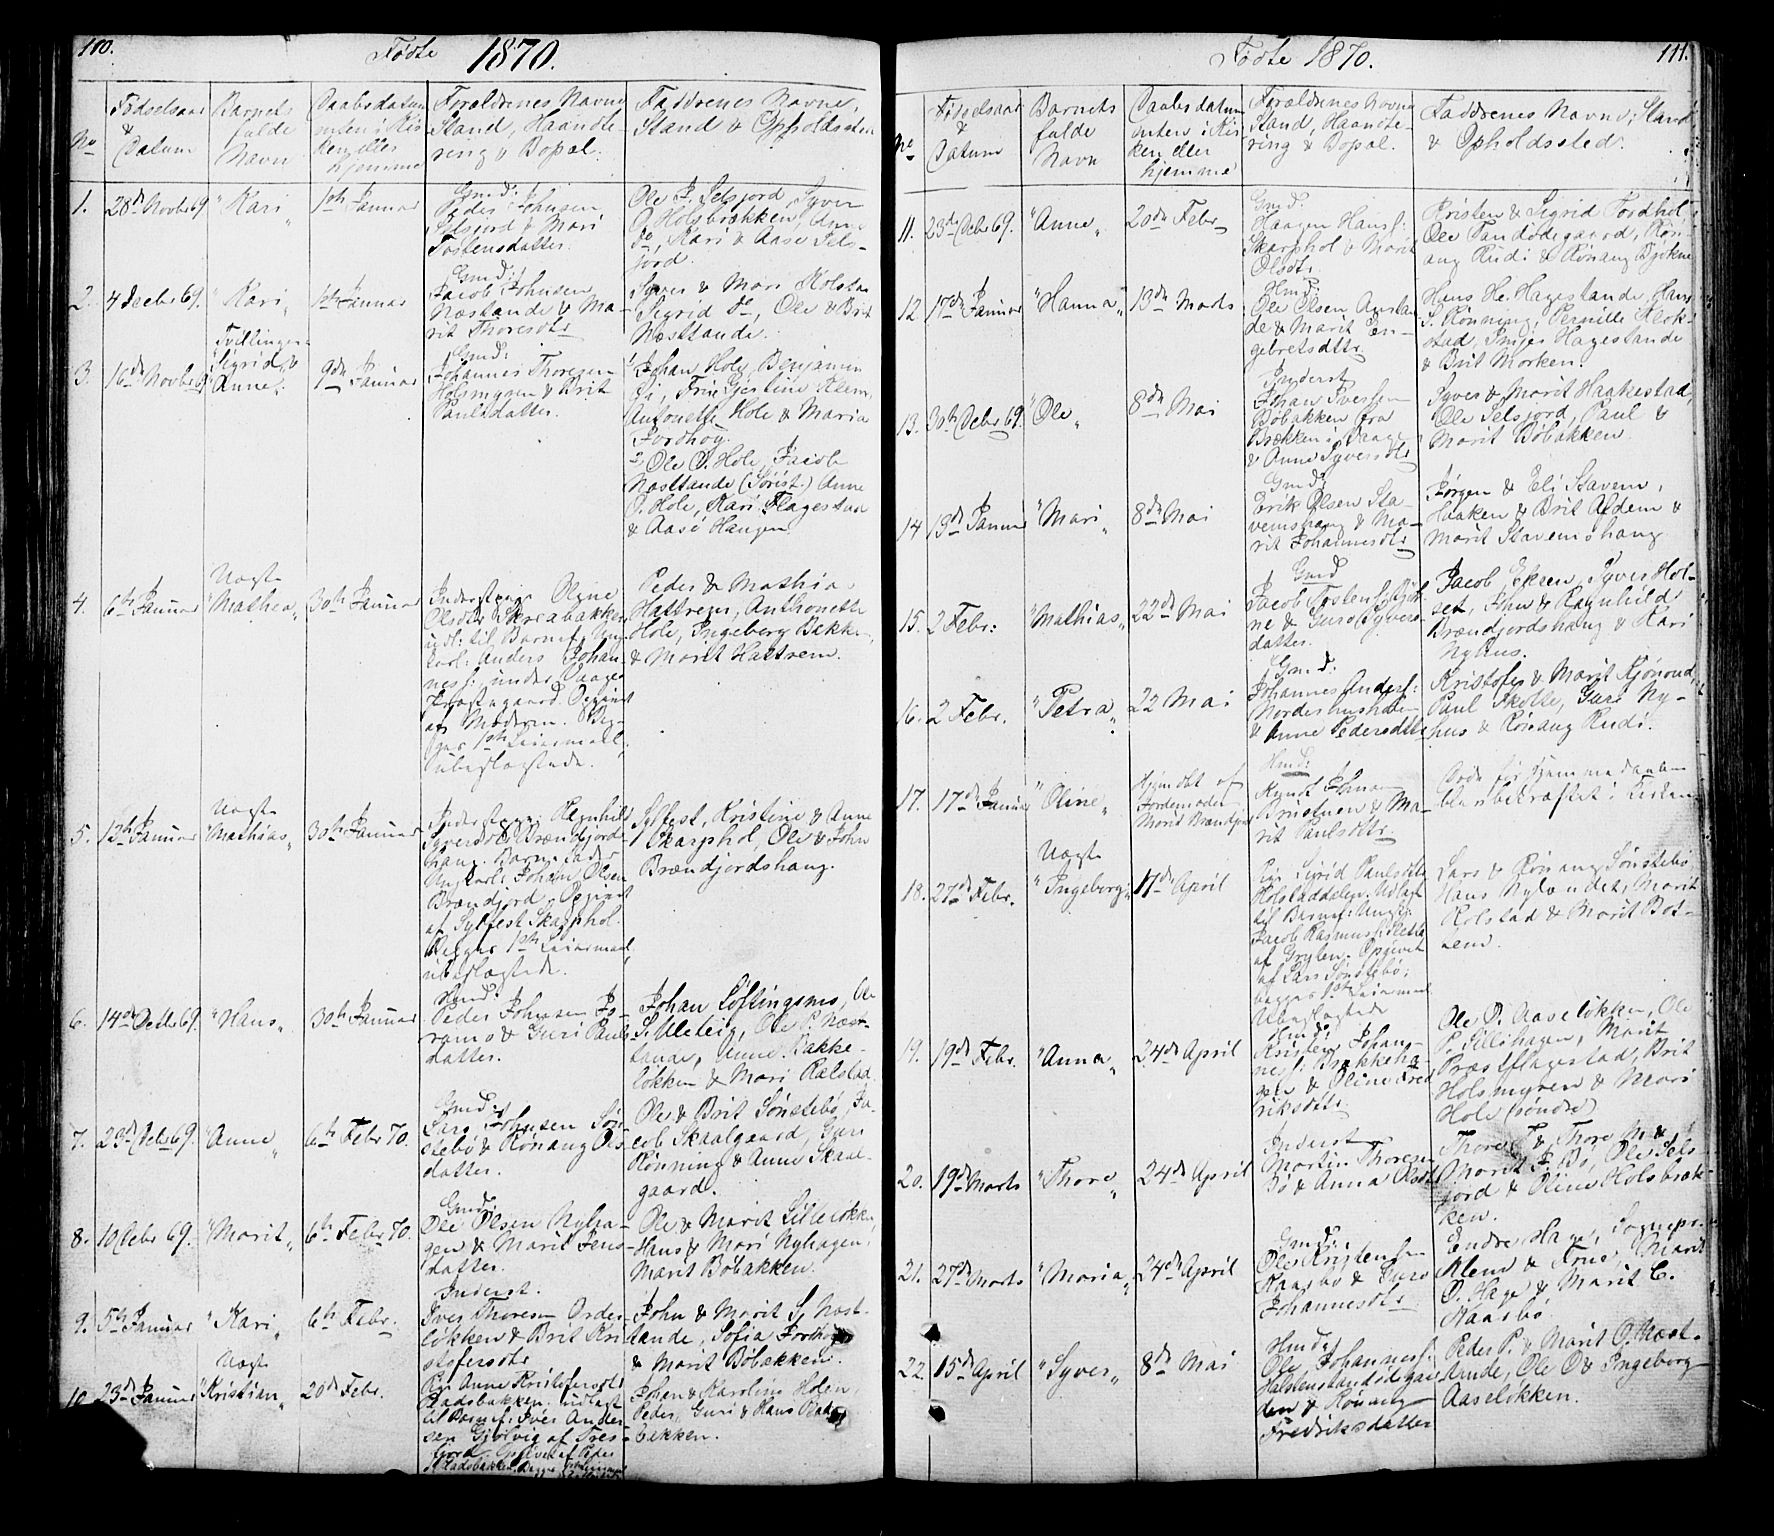 SAH, Lesja prestekontor, Klokkerbok nr. 5, 1850-1894, s. 110-111